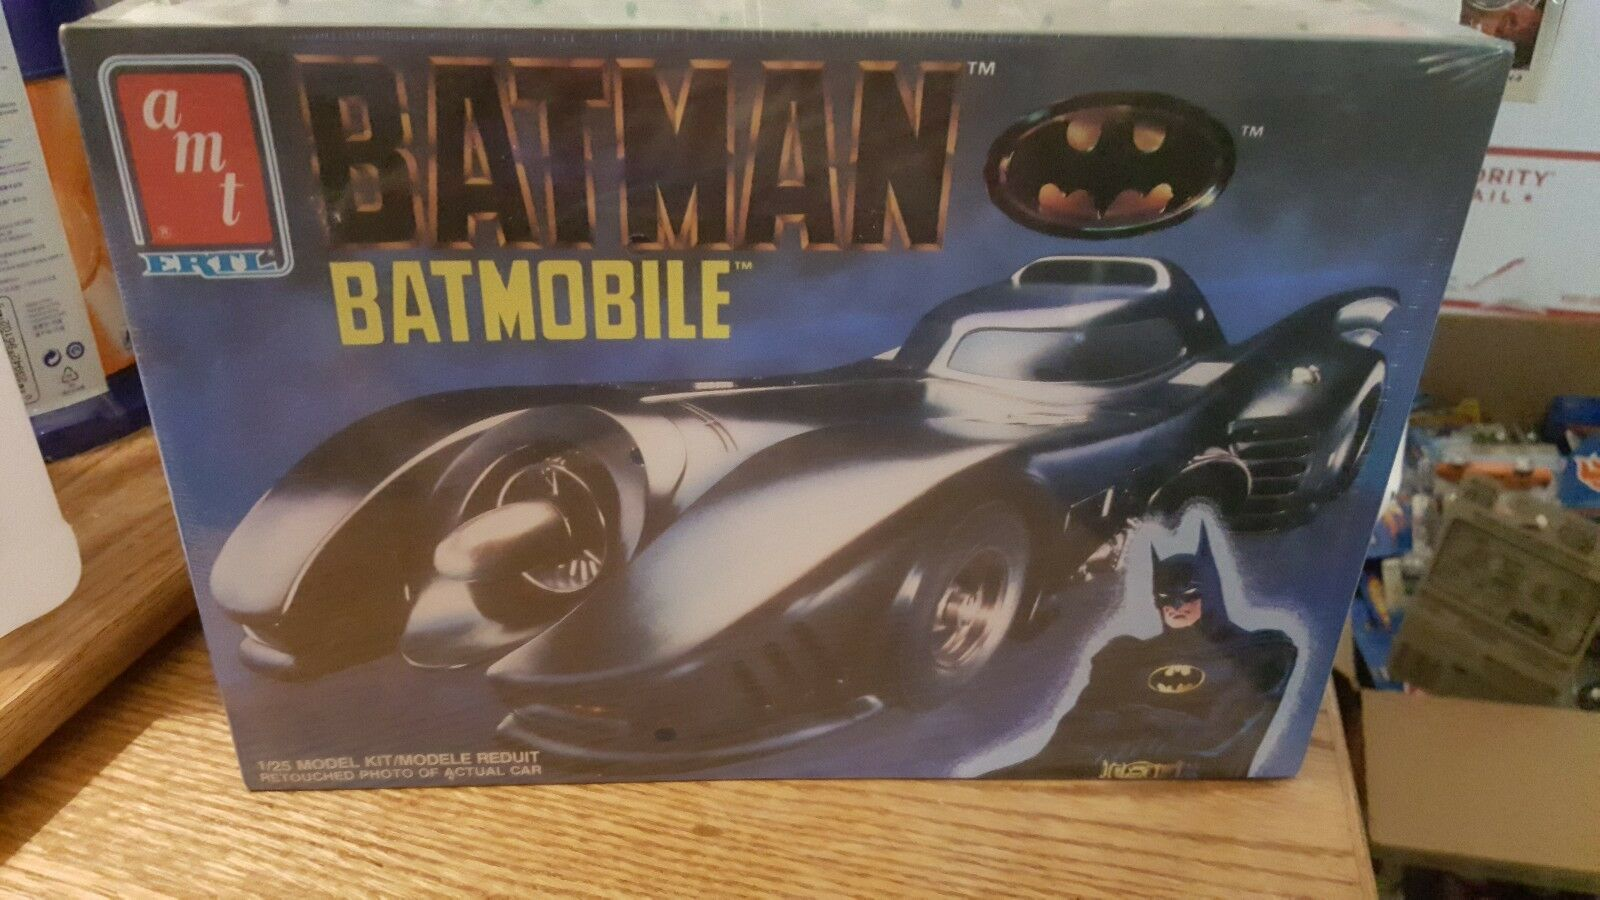 1989 Vintage Sealed AMT ERTL Batman Batmobile MODEL KIT  25 scale NISB